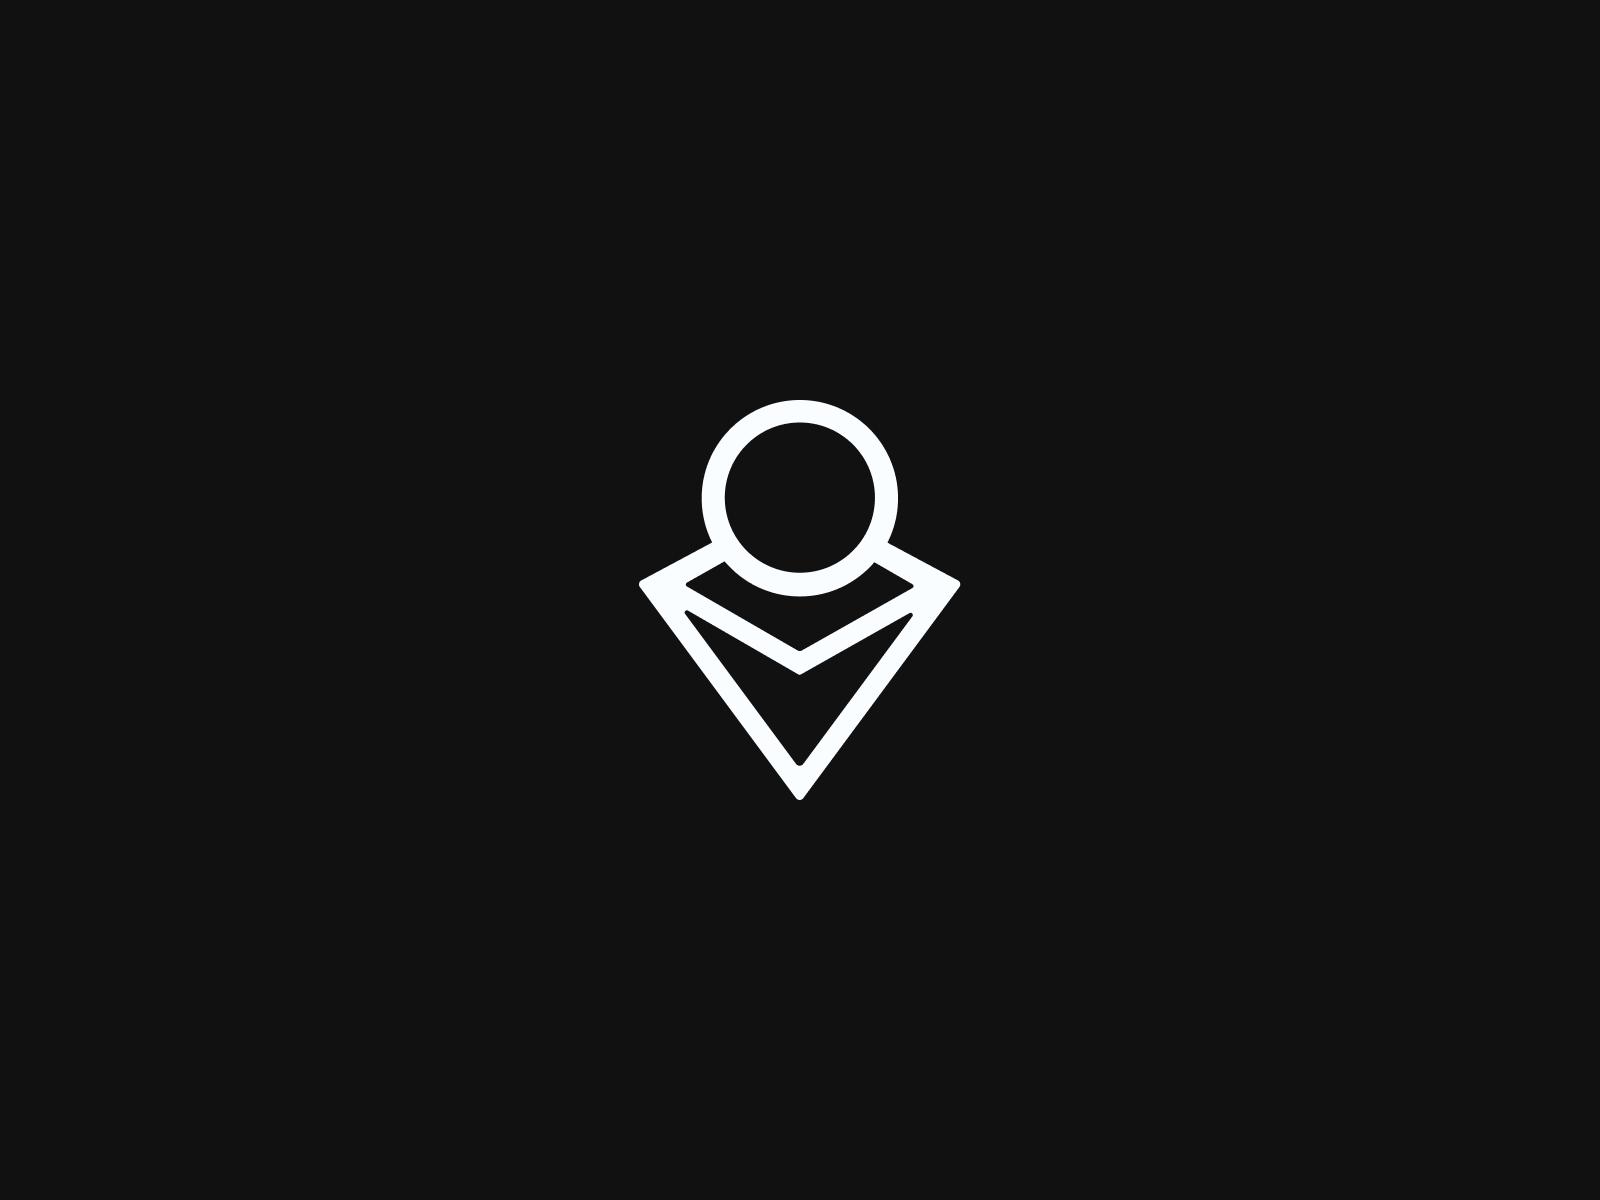 Flick - The Bitclout App Logo